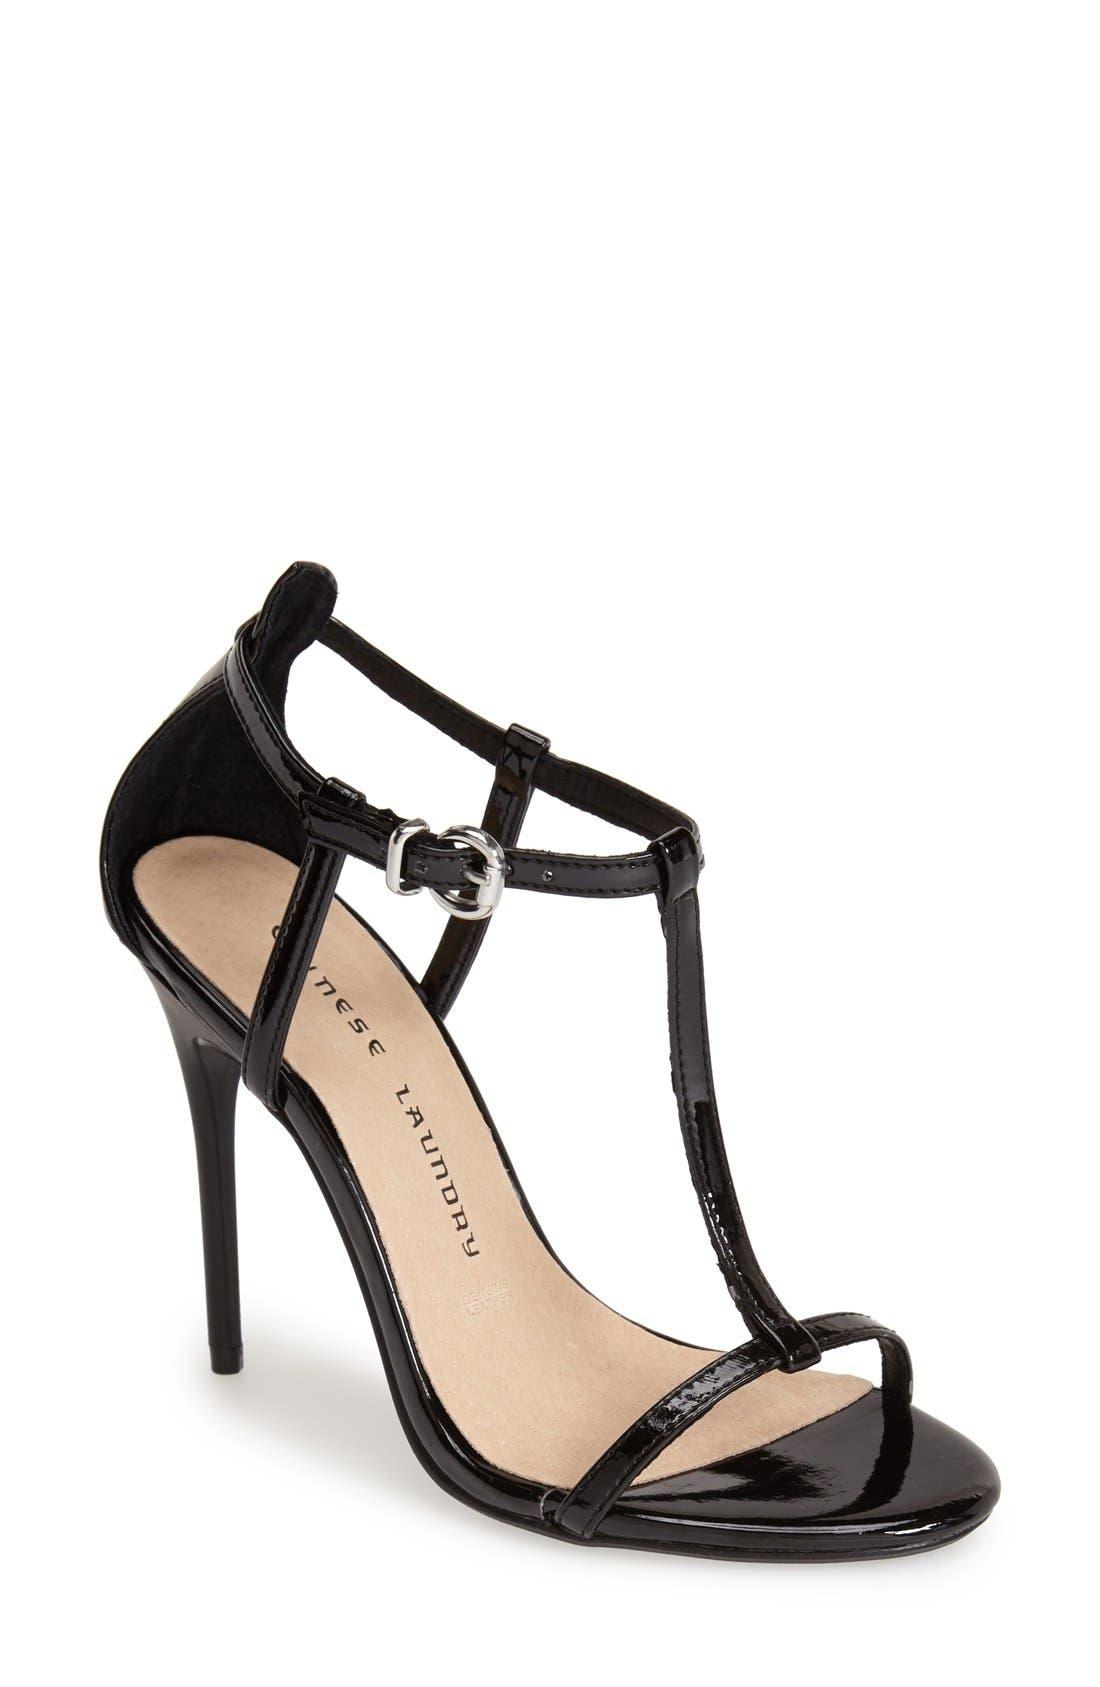 Main Image - Chinese Laundry 'Leo' Patent T-Strap Sandal (Women)